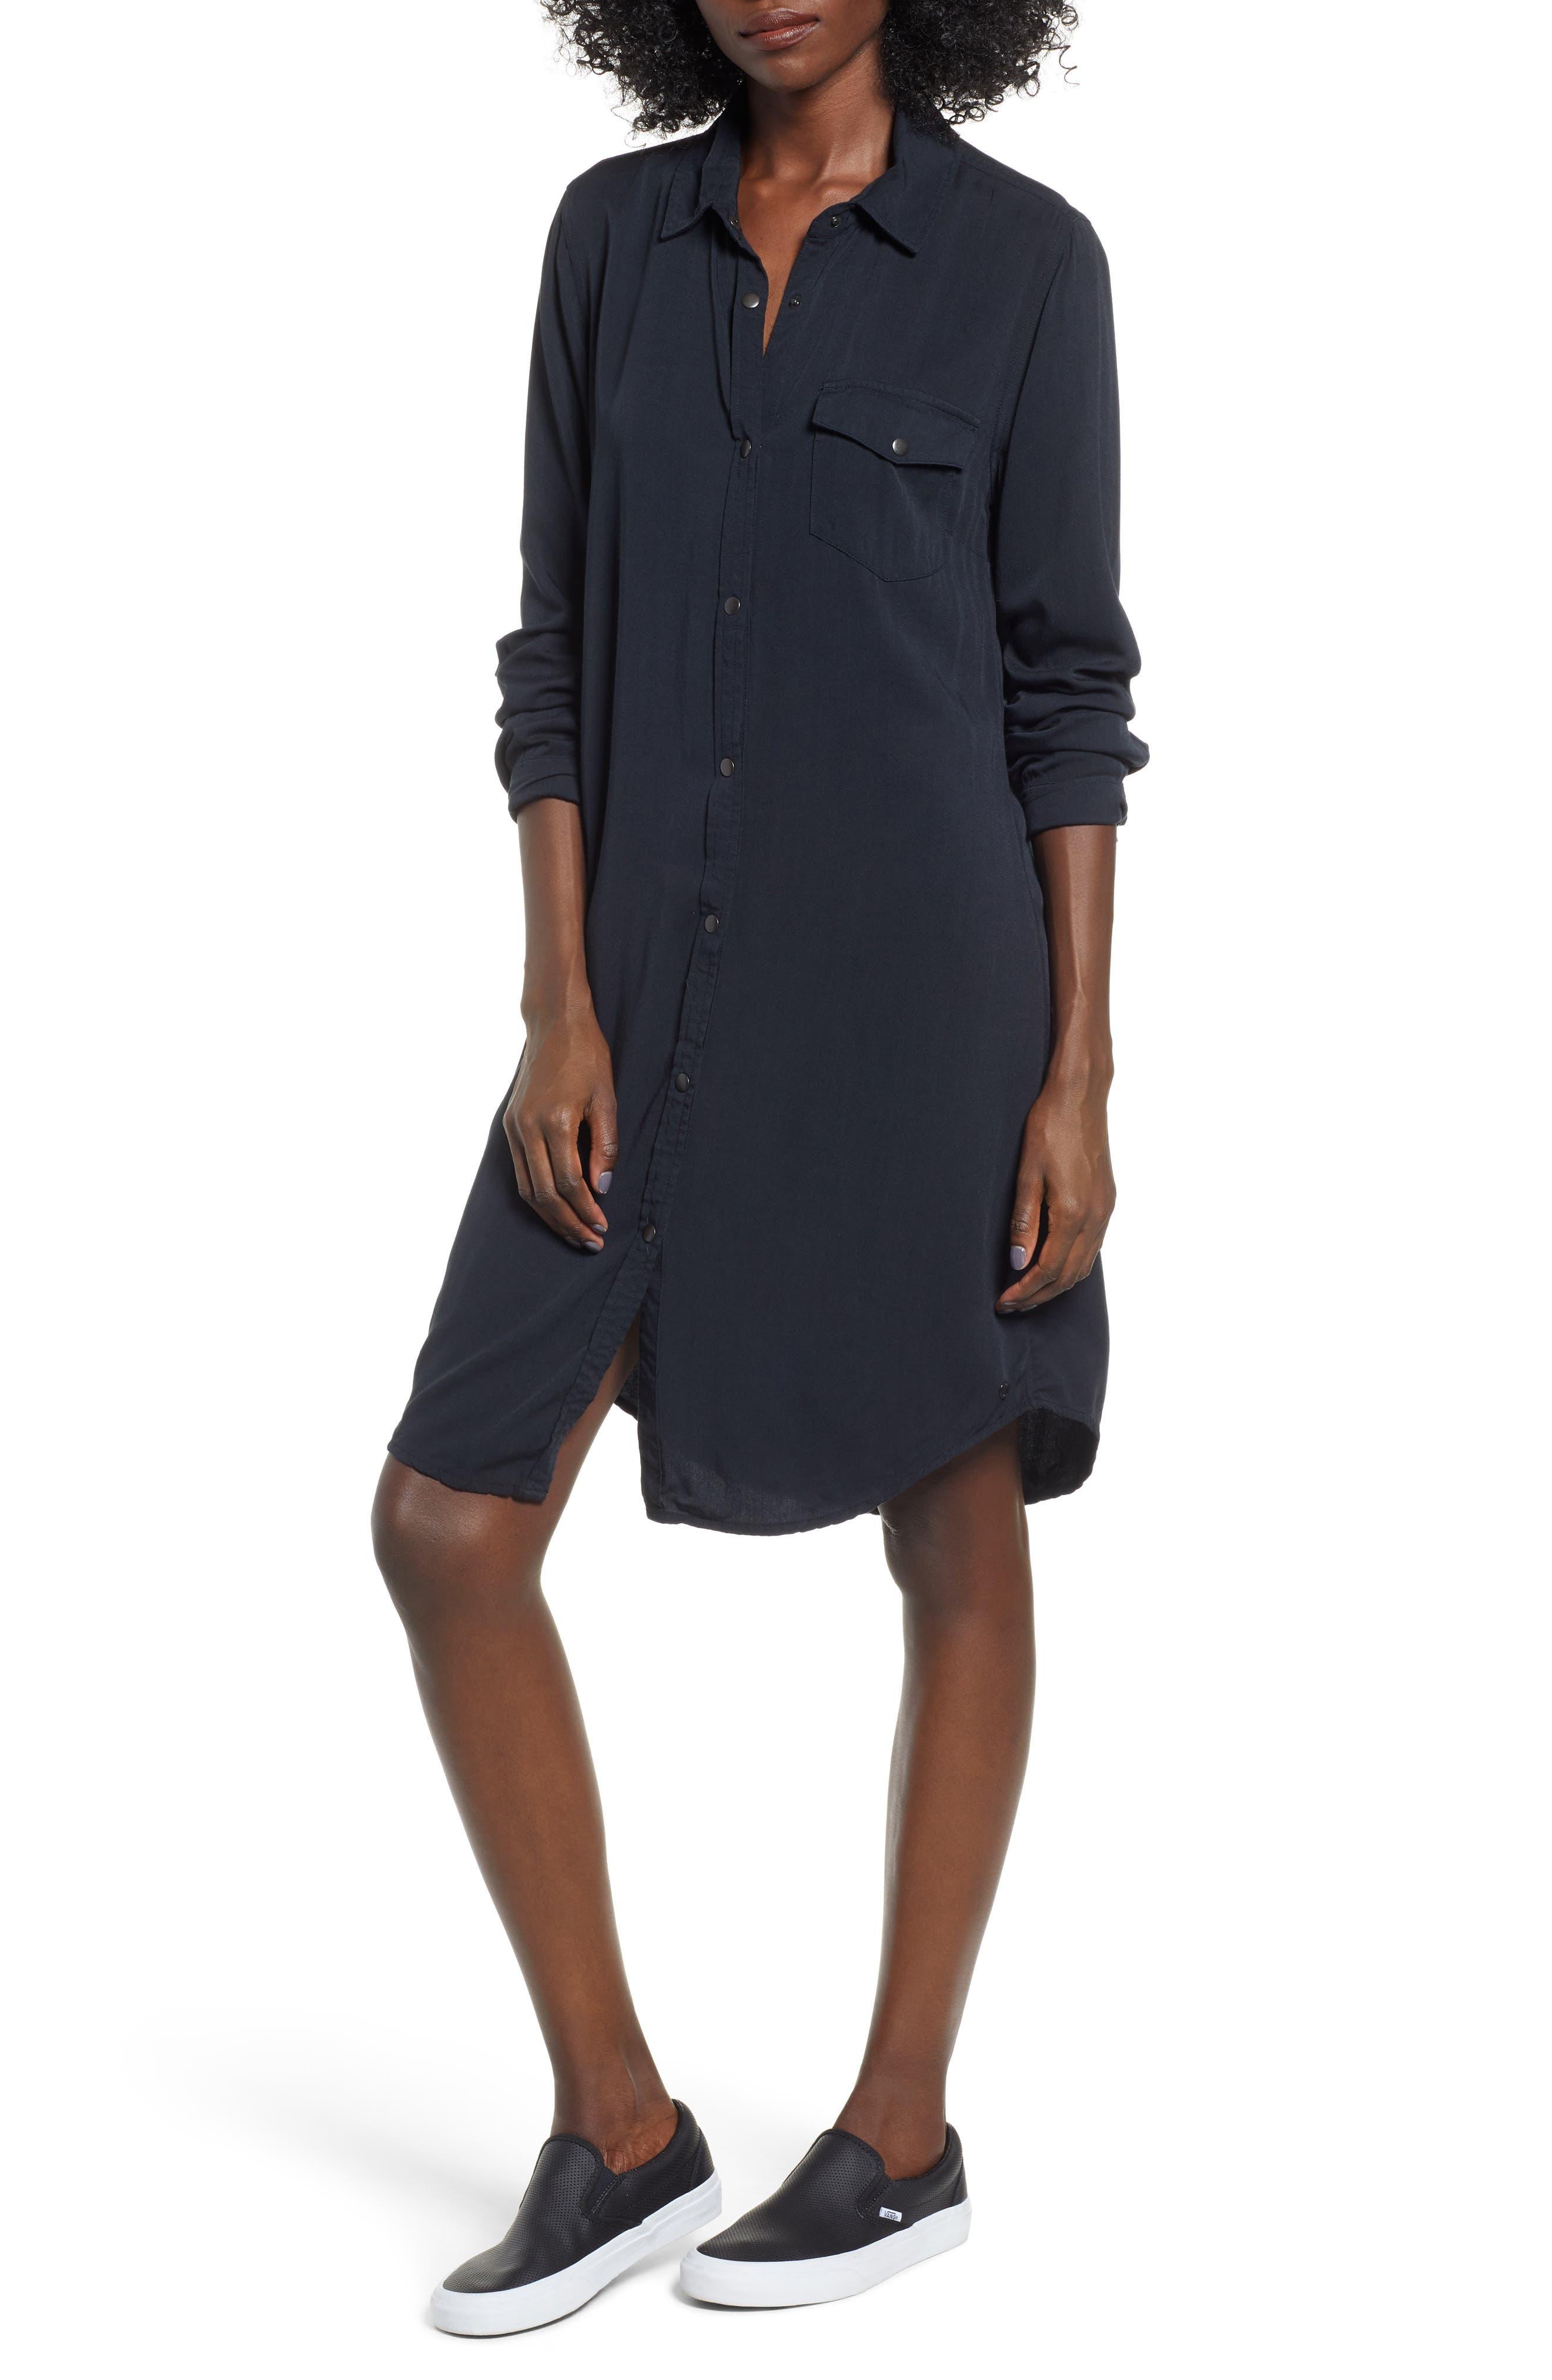 Tomini Bay View Shirtdress, Main, color, TRUE BLACK